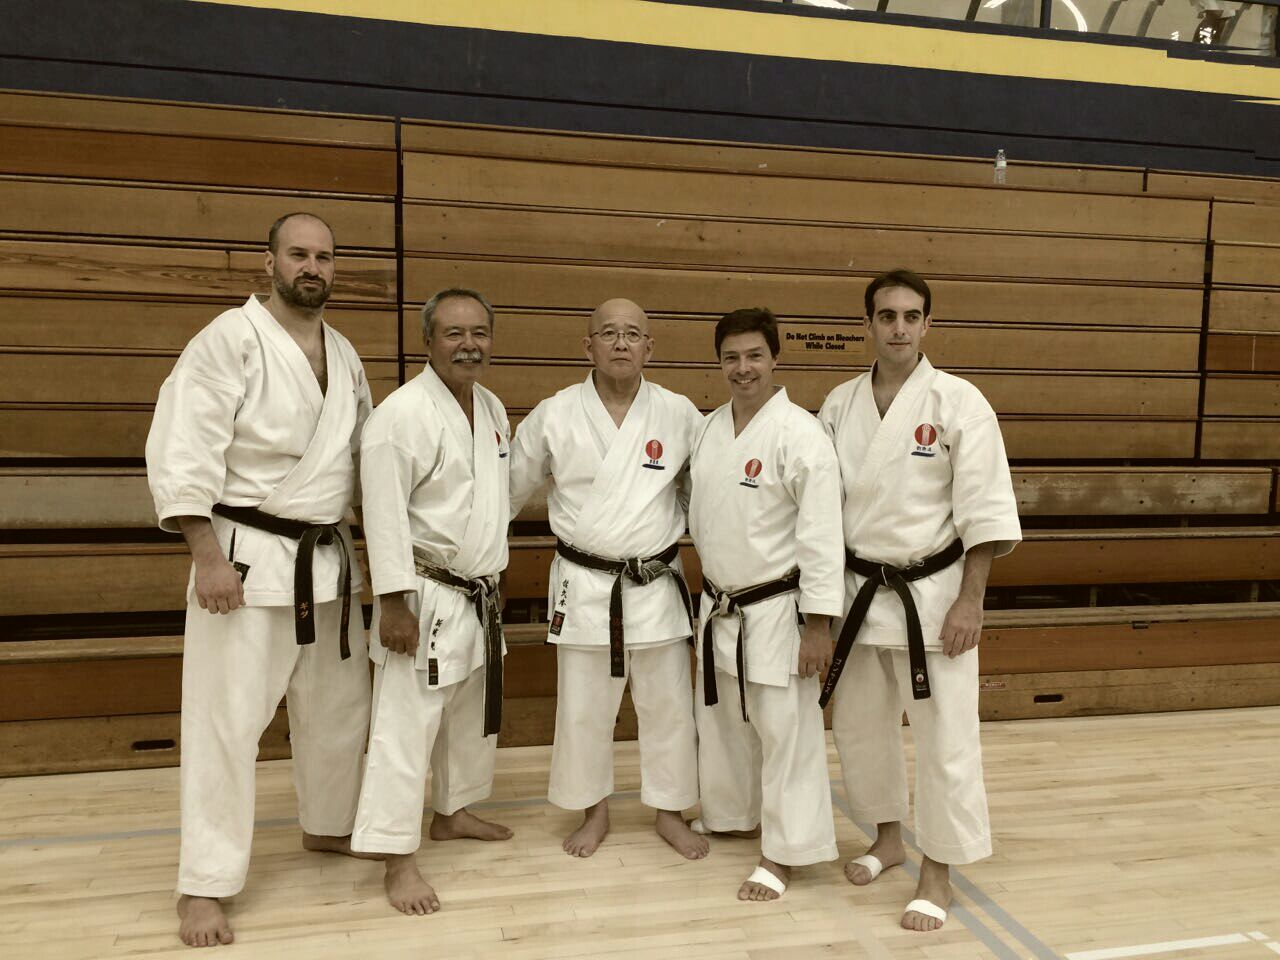 Delegación Ryuei-Ryu Argentina (D. Guida, H. Gonzalez, Saporiti Sensei) junto a Tsuguo Sakumoto y Tomohiro Arashiro, líderes del estilo.